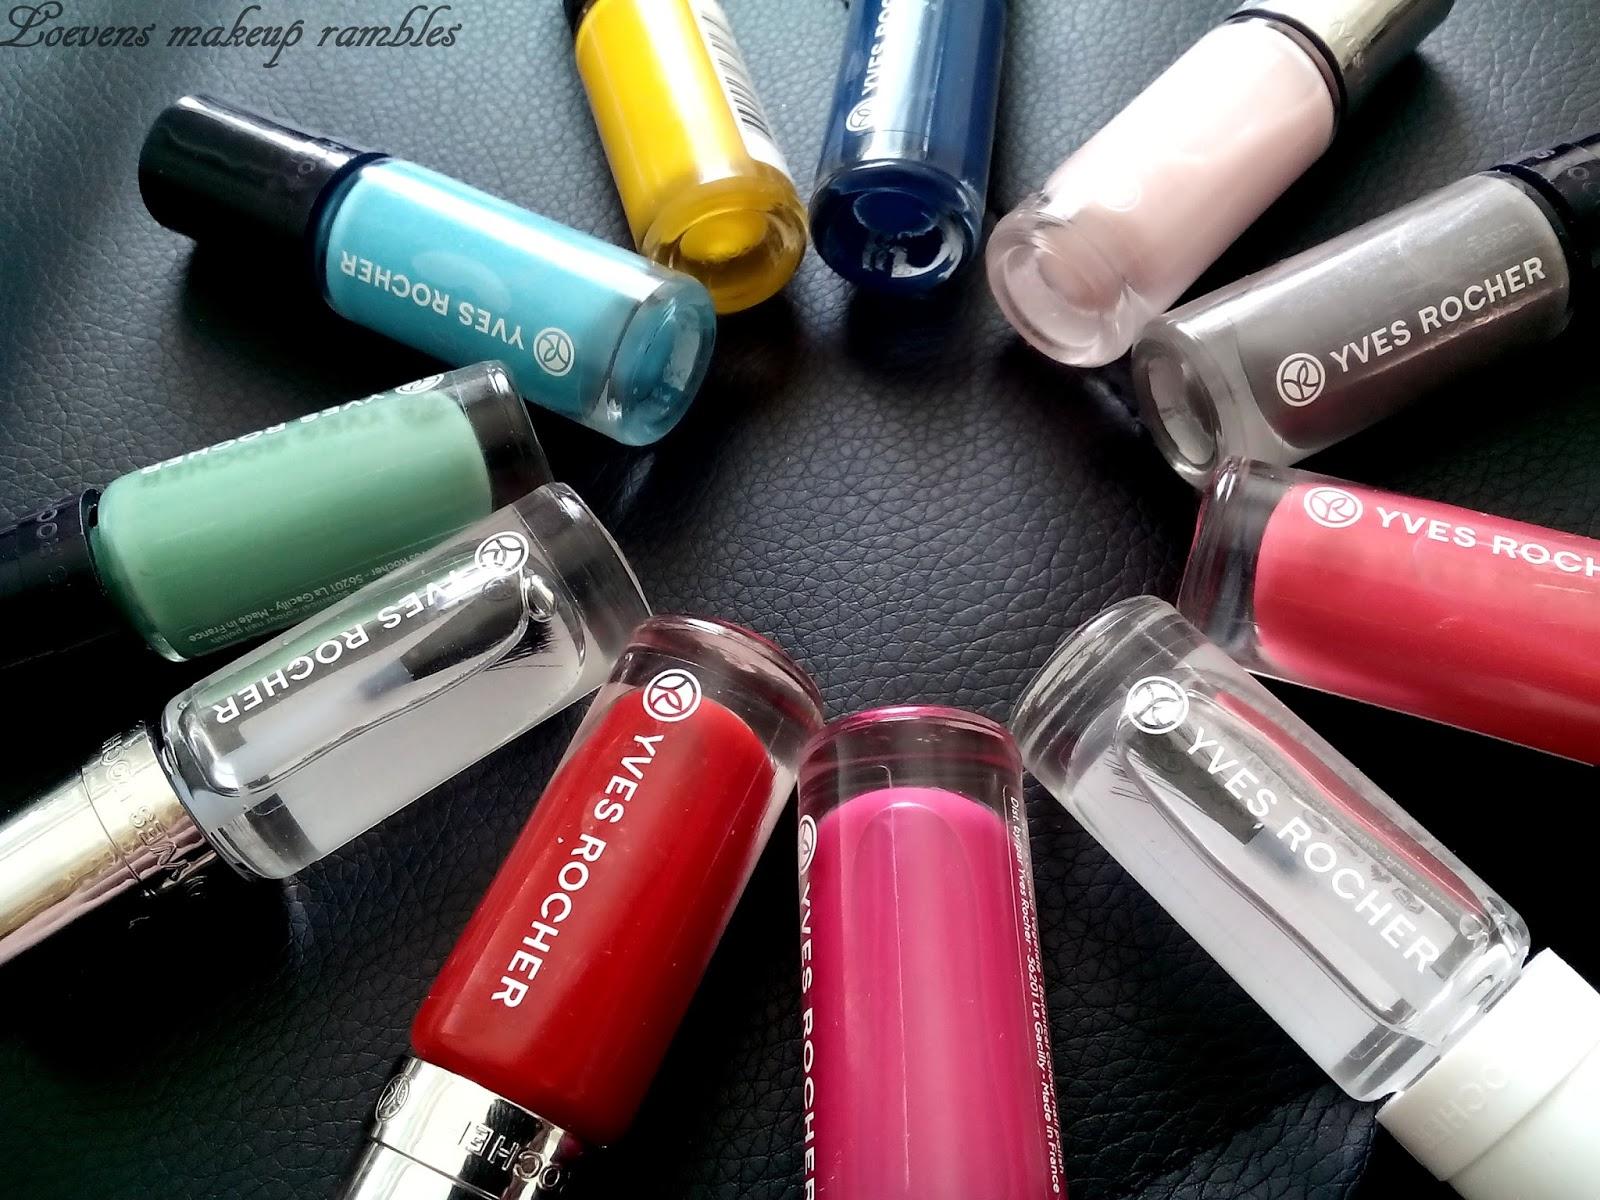 Yves Rocher NEW nail polishes! | *Loevens makeup rambles*